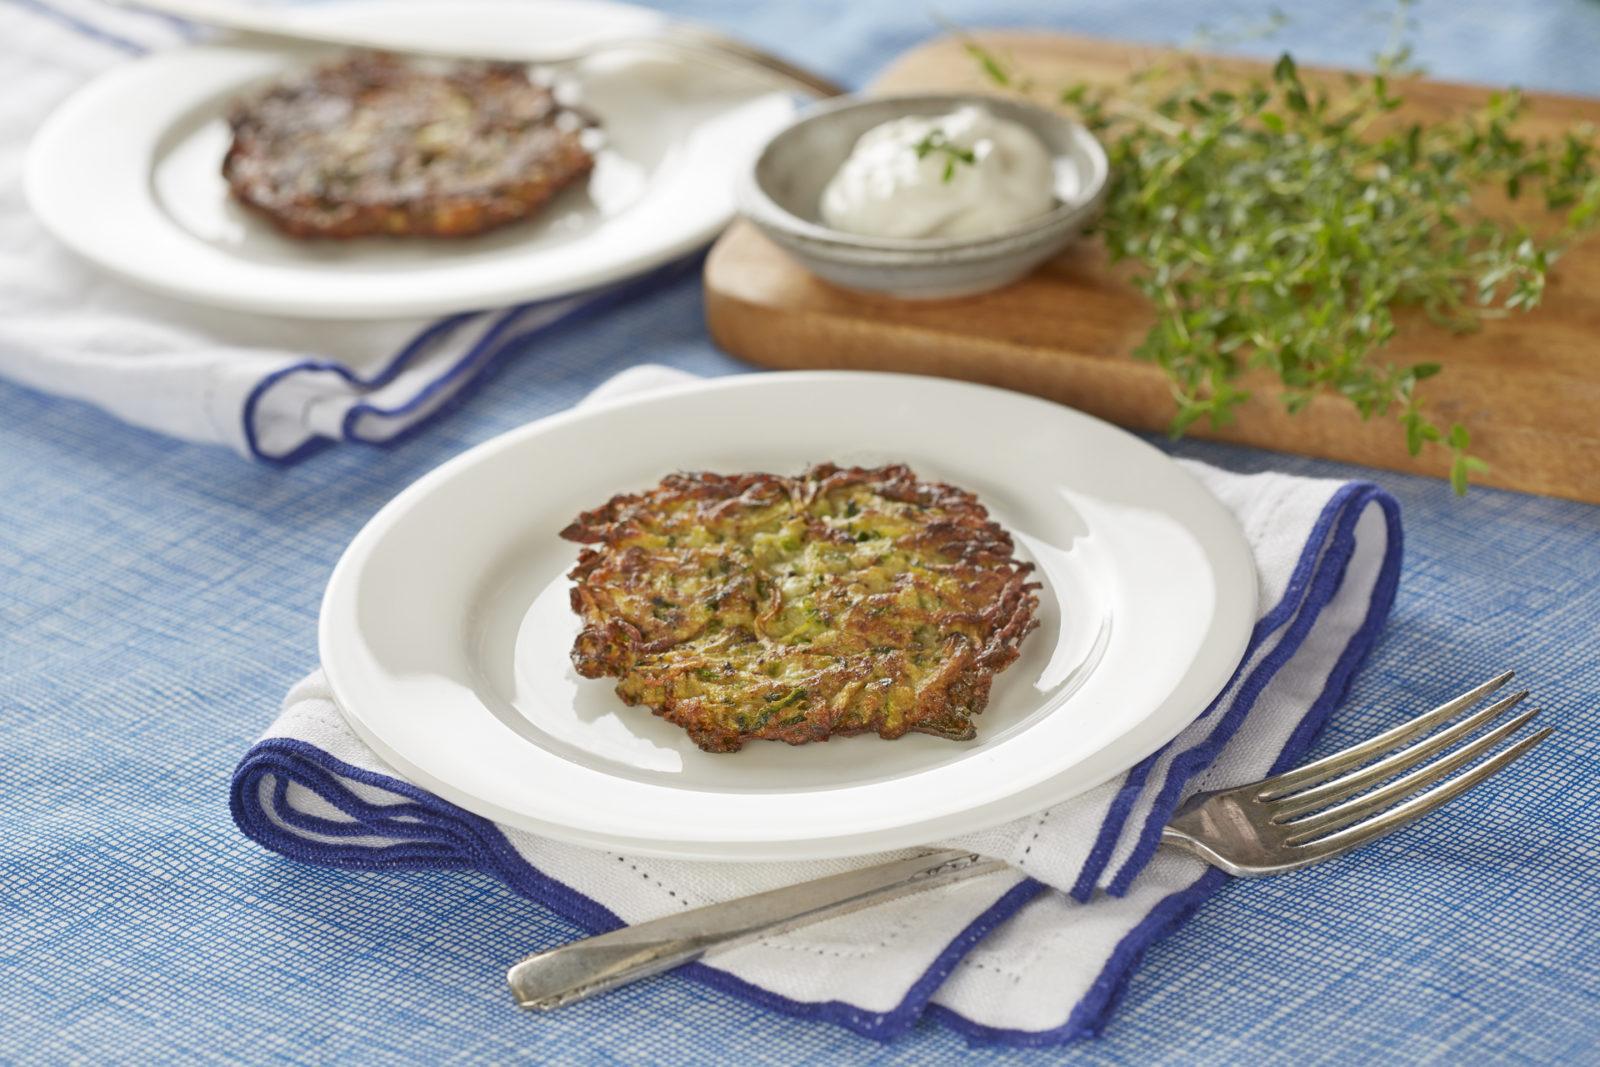 Gluten-Free Zucchini Latkes